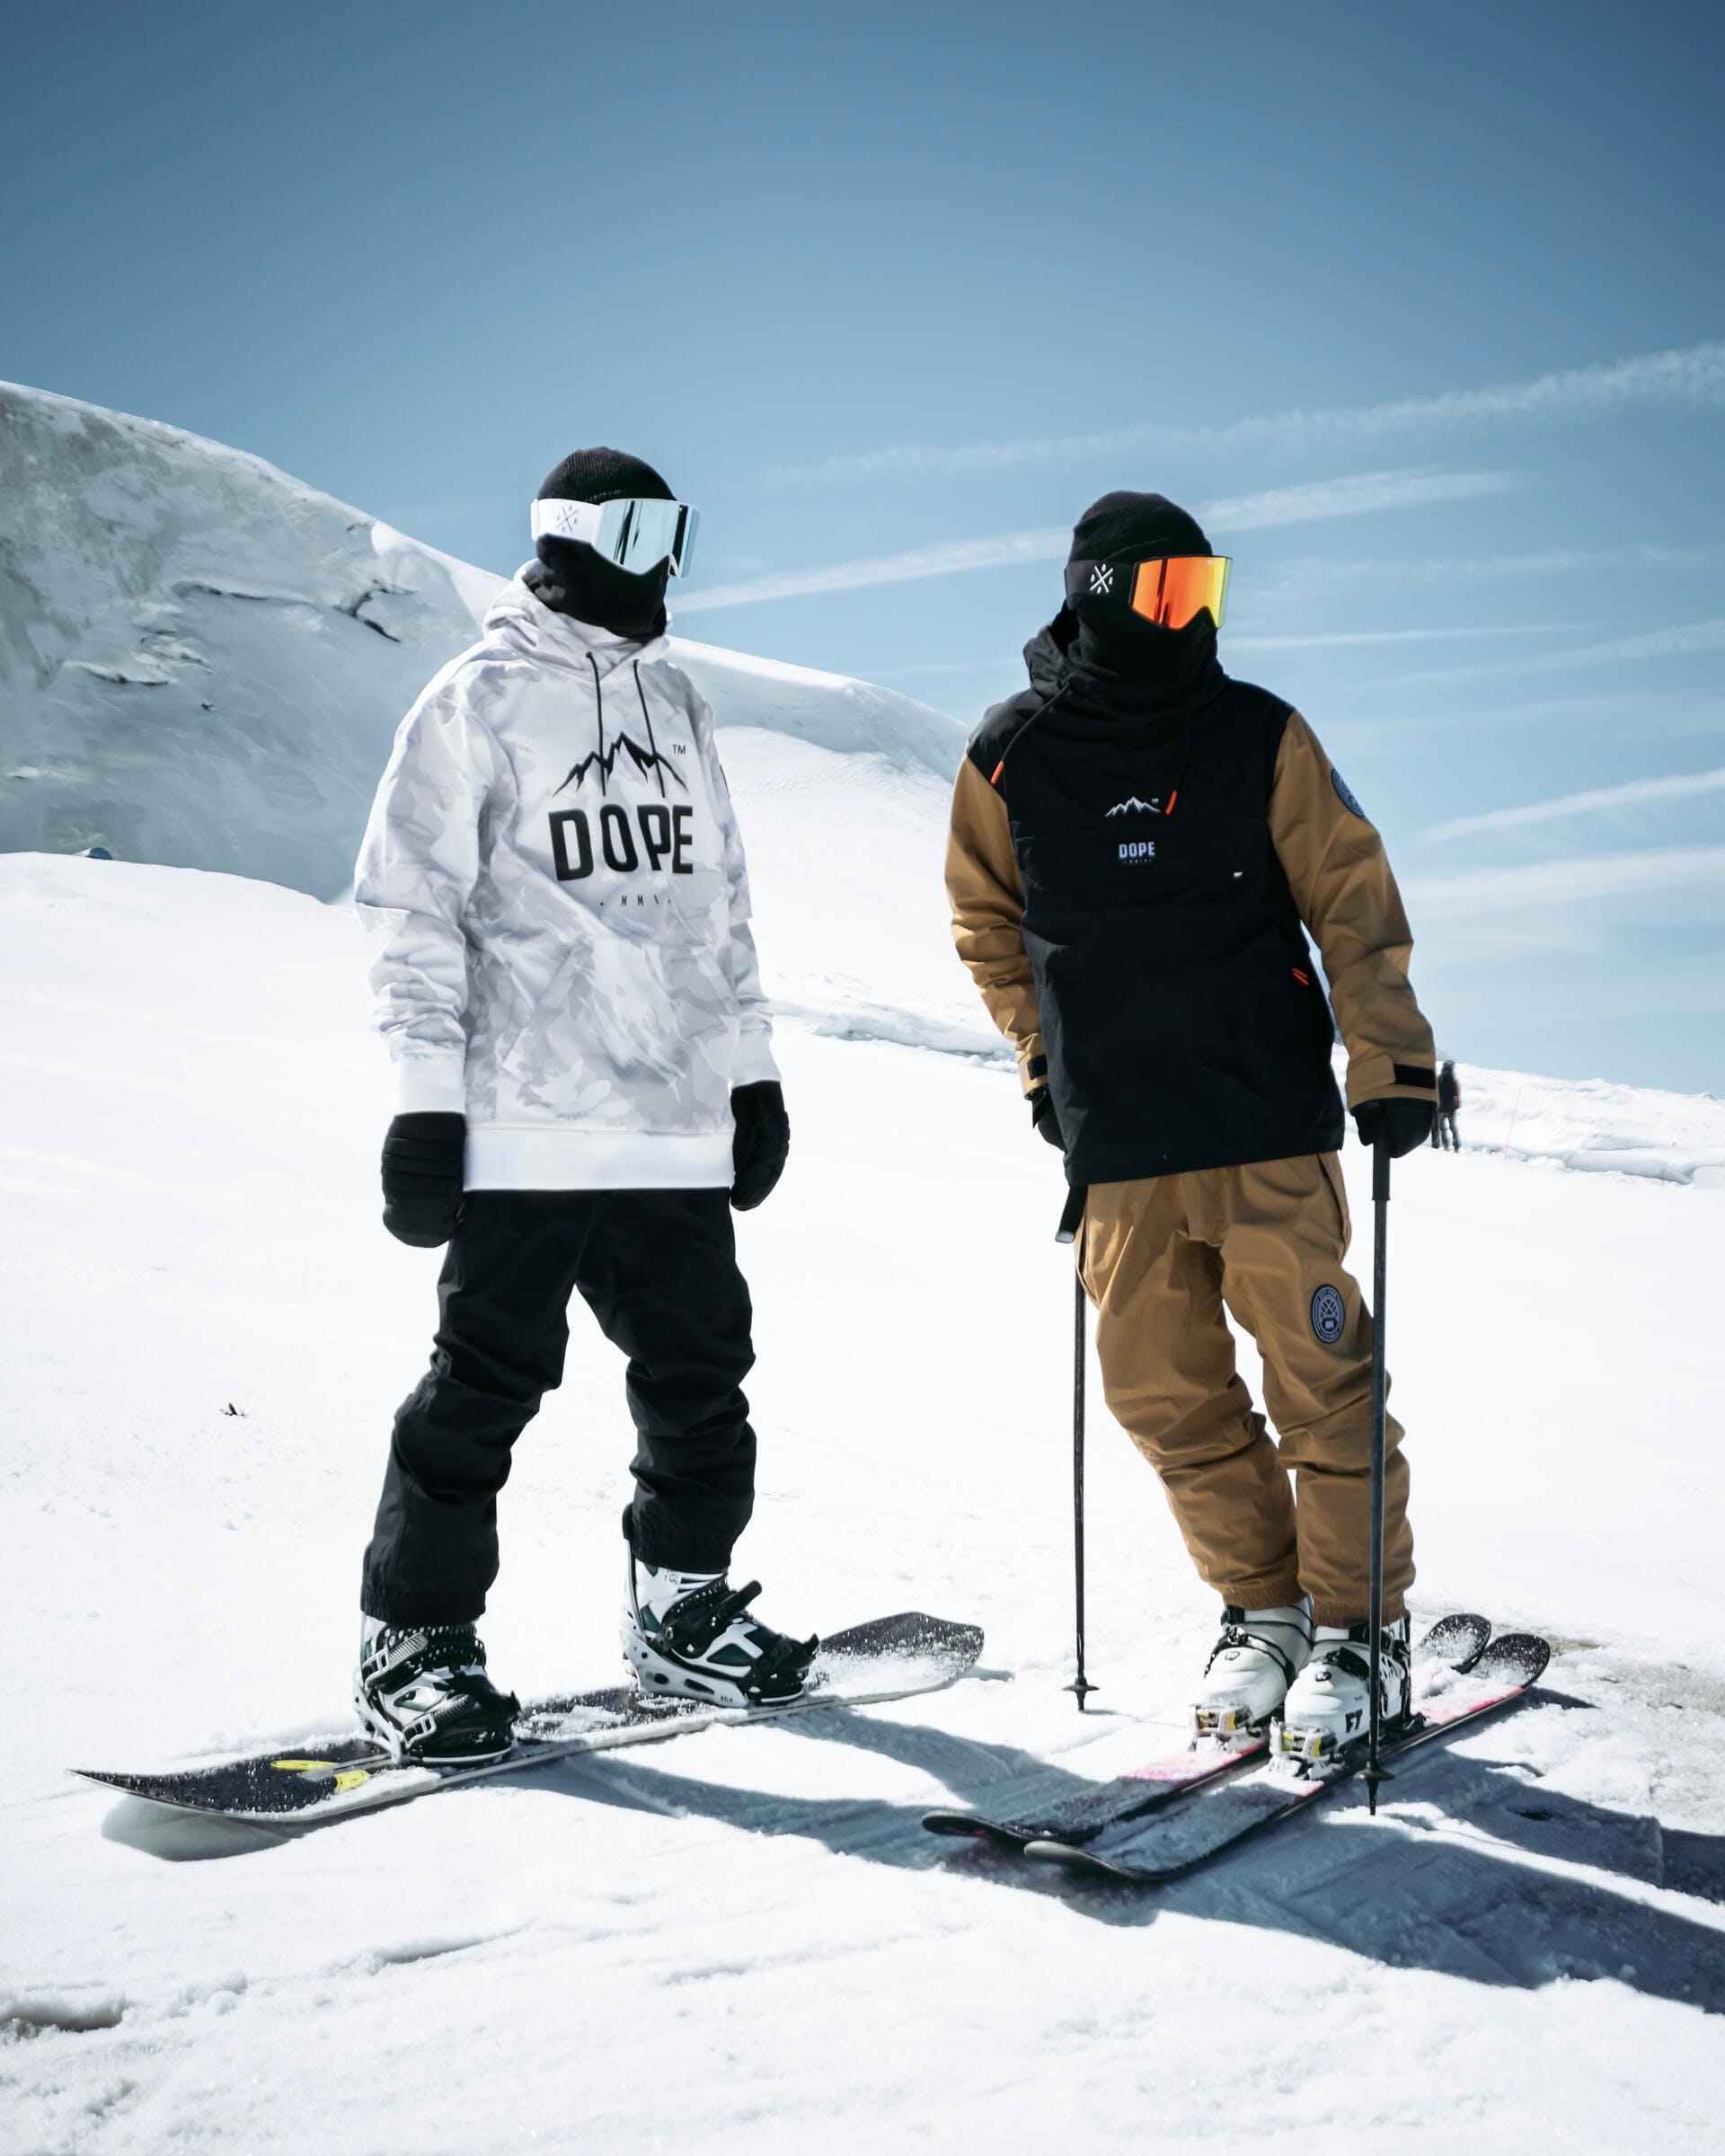 ski and snowboard instructors